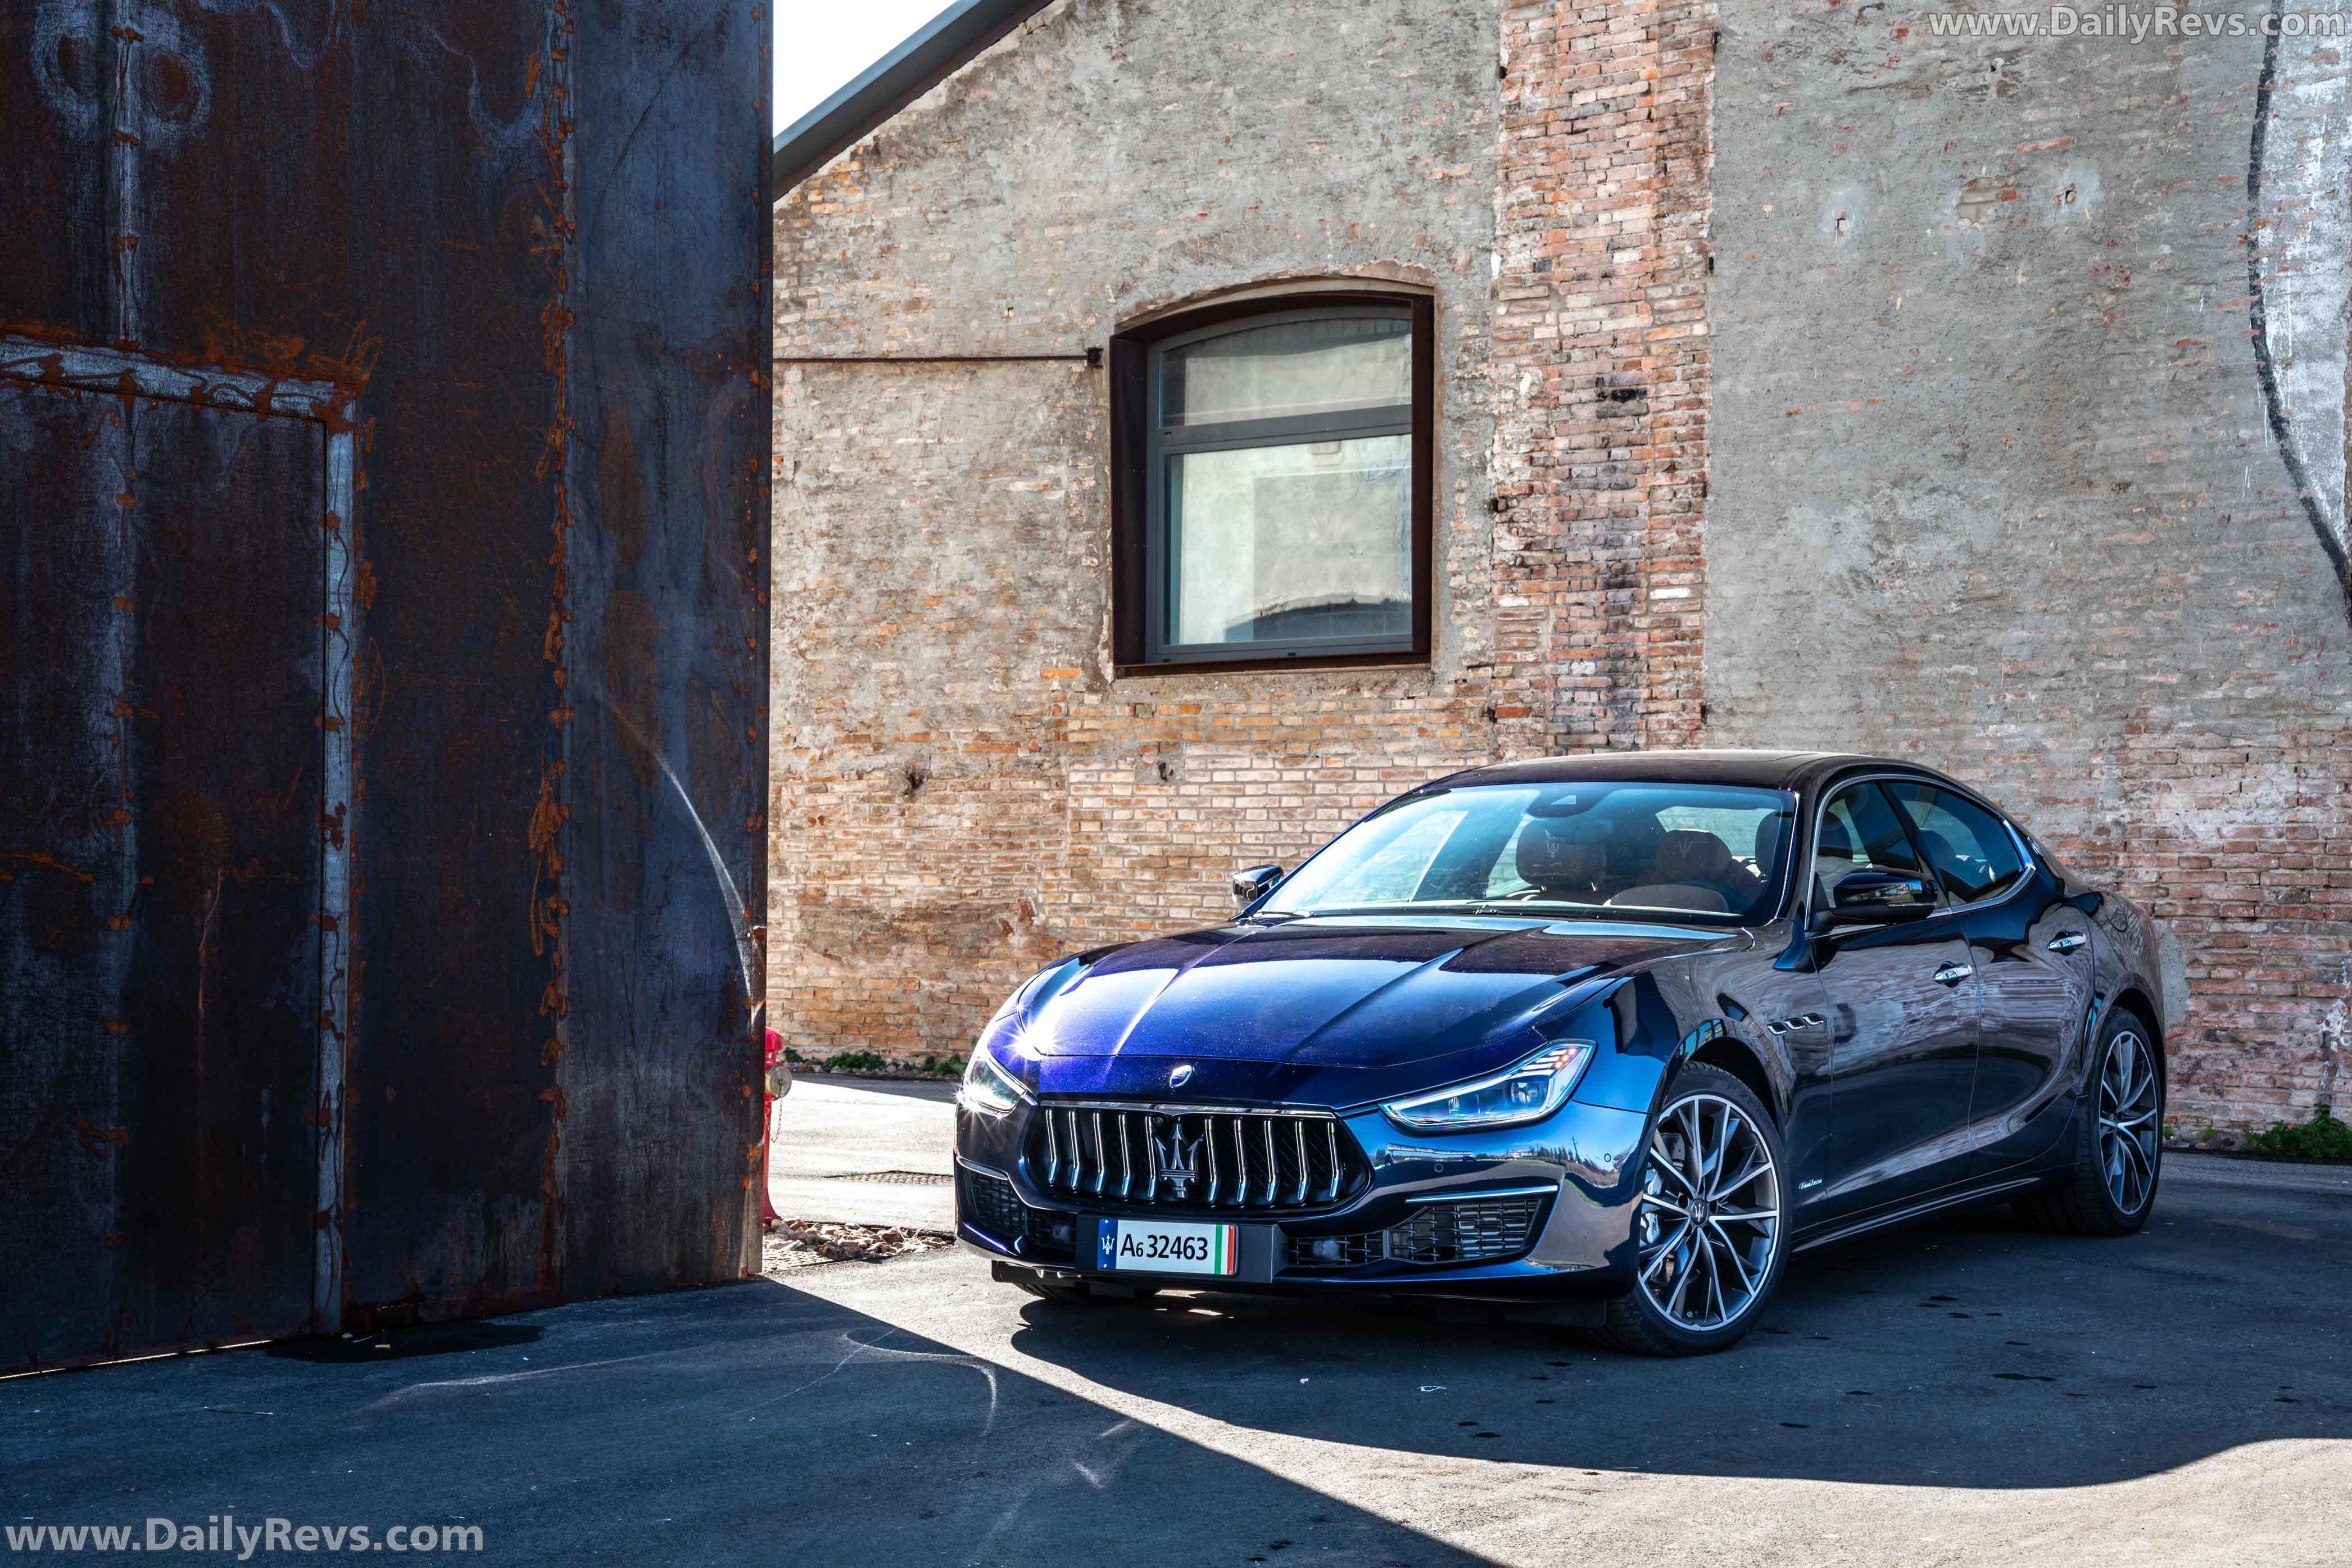 2021 Maserati Ghibli SQ4 - Dailyrevs